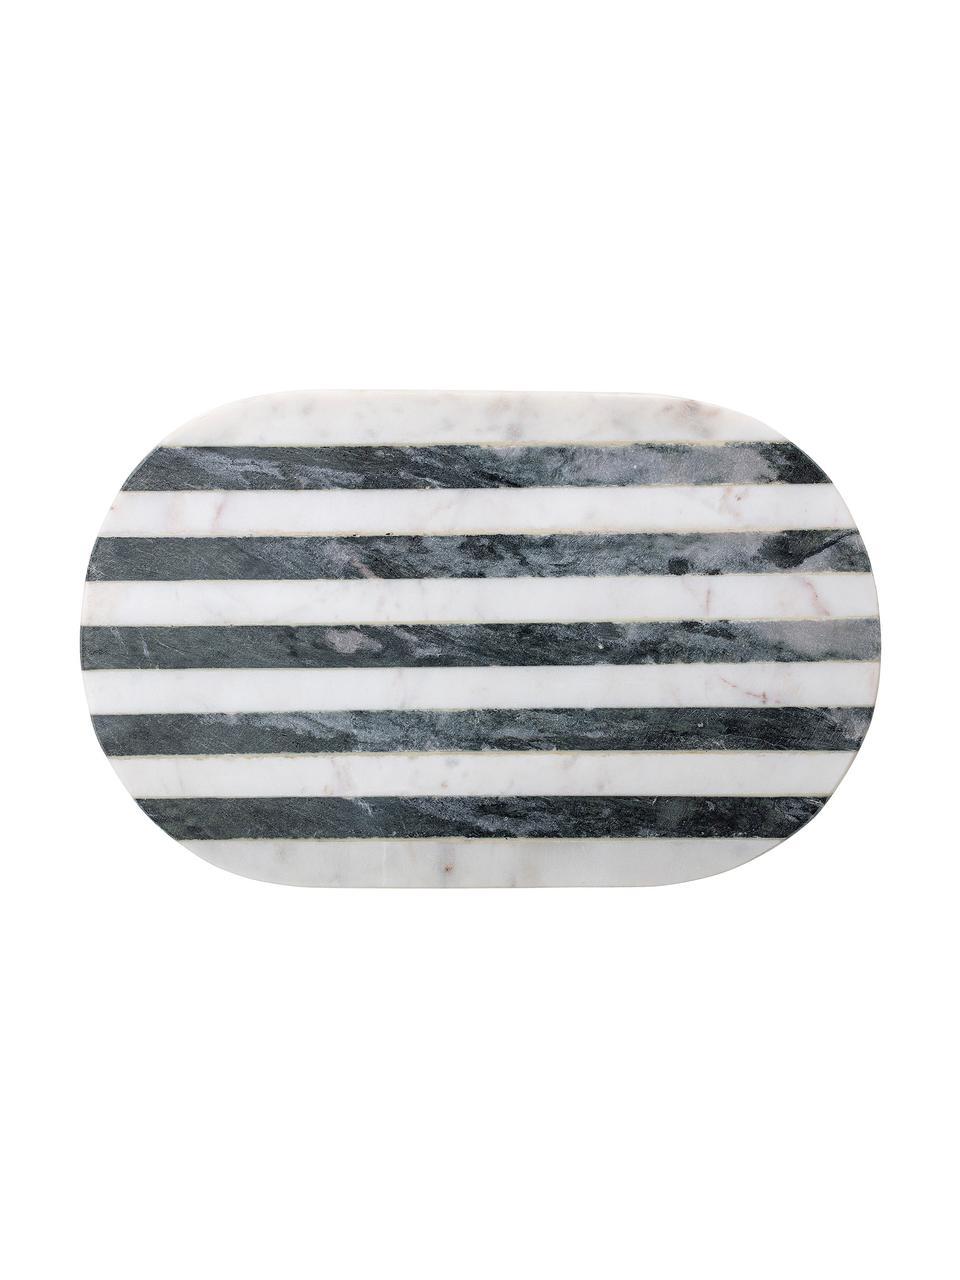 Deska do krojenia z marmuru Stripes, Marmur, Czarny, biały, D 37 x S 23 cm